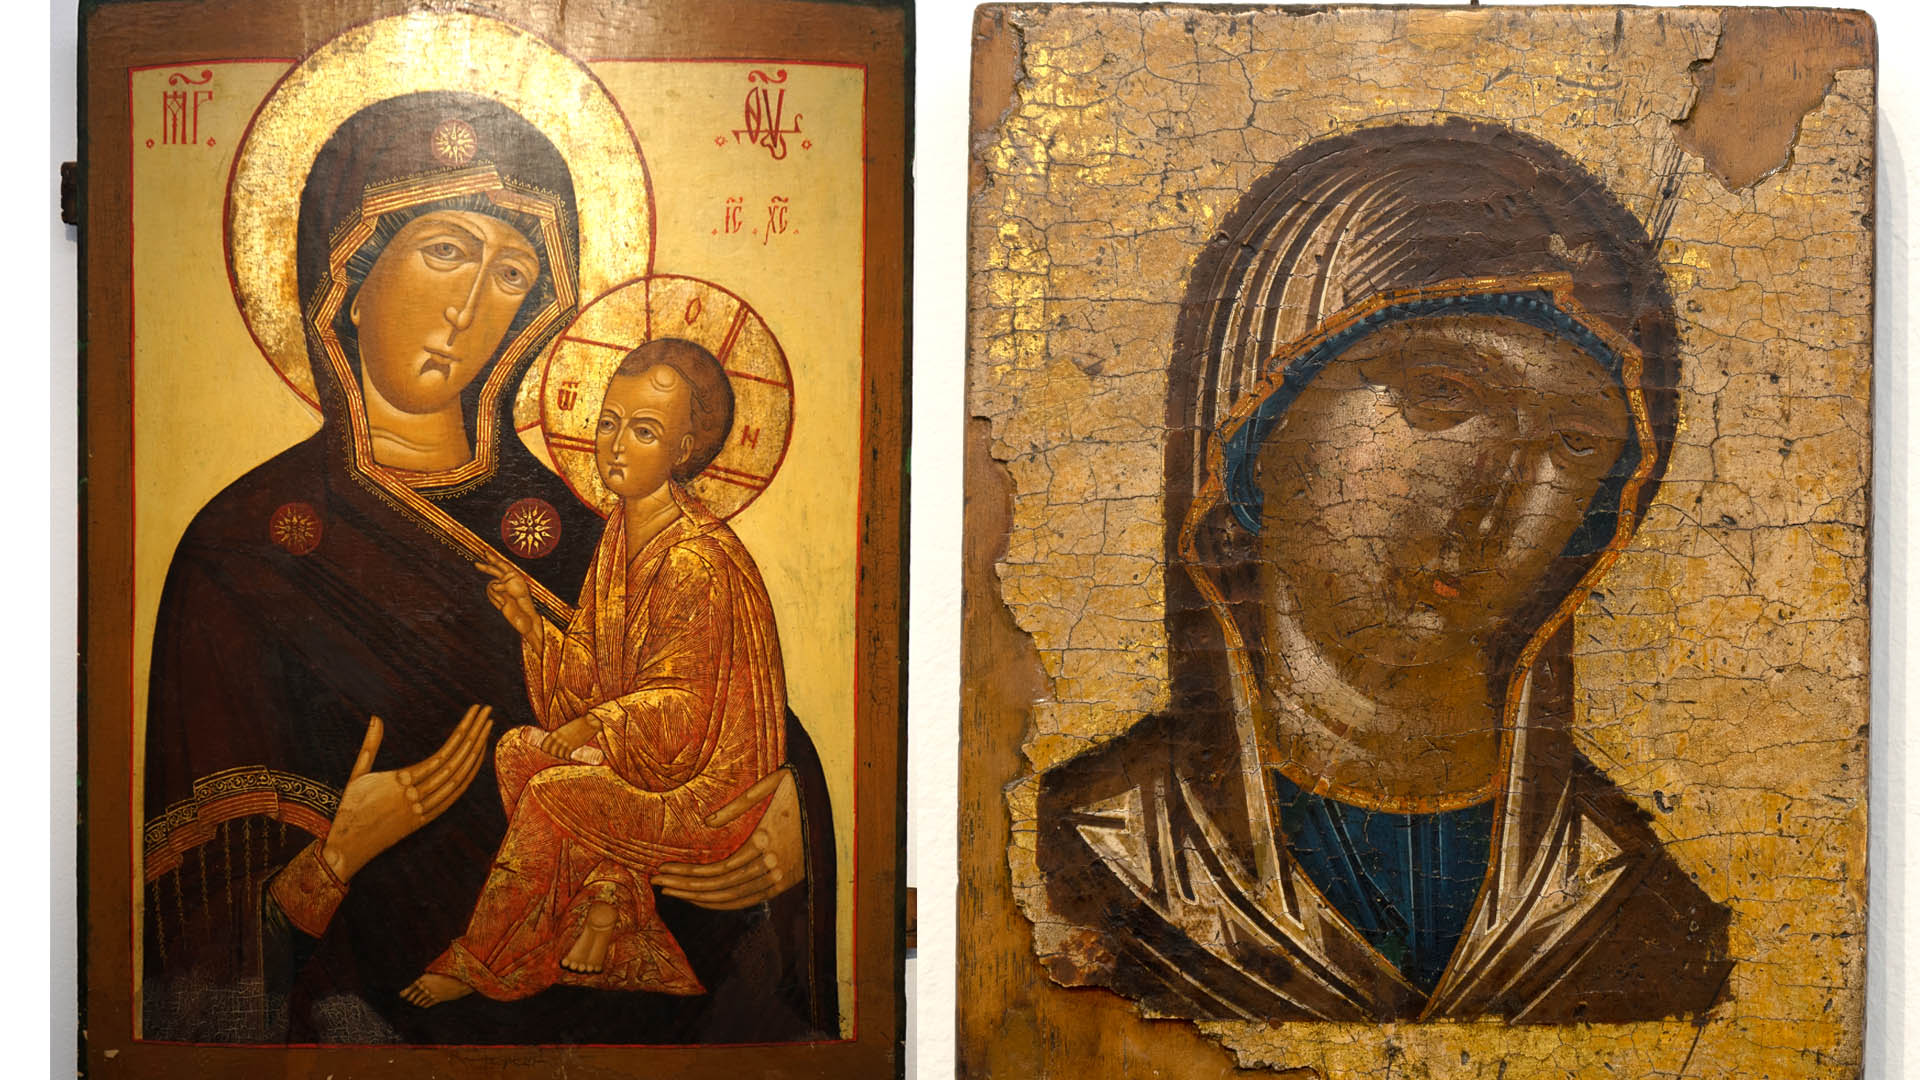 Links: Muttergottes, Griechenland, 16. Jahrhundert; Rechts: Muttergottes von Tichvin, Russland, 19. Jahrhundert